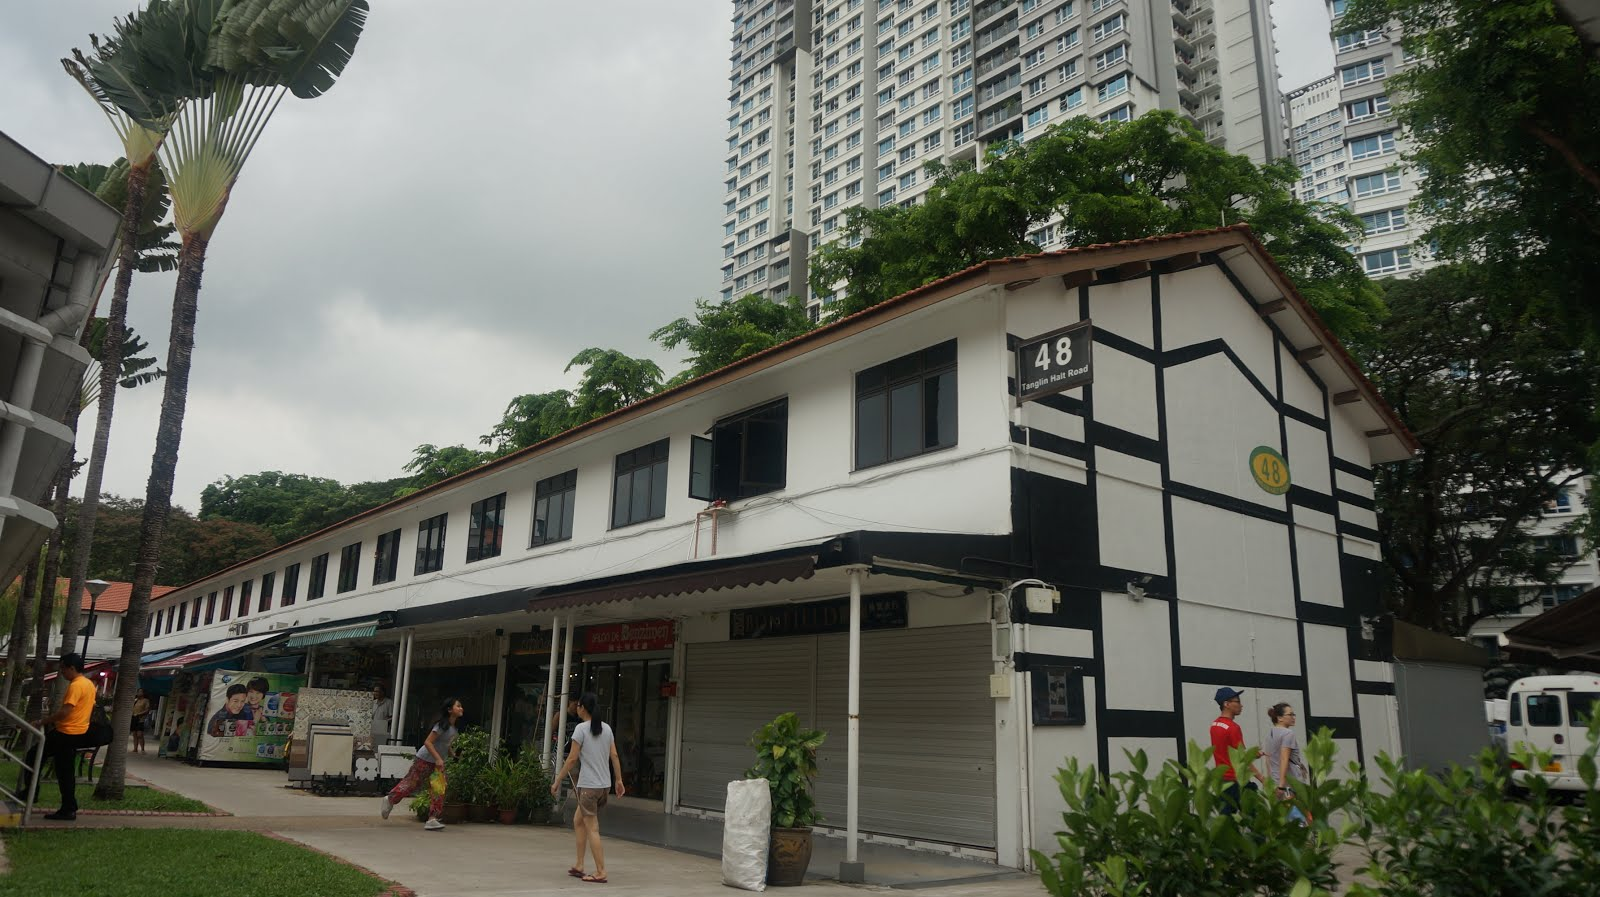 Dayang Yraola: Tanglin Halt (Queenstown, Singapore)